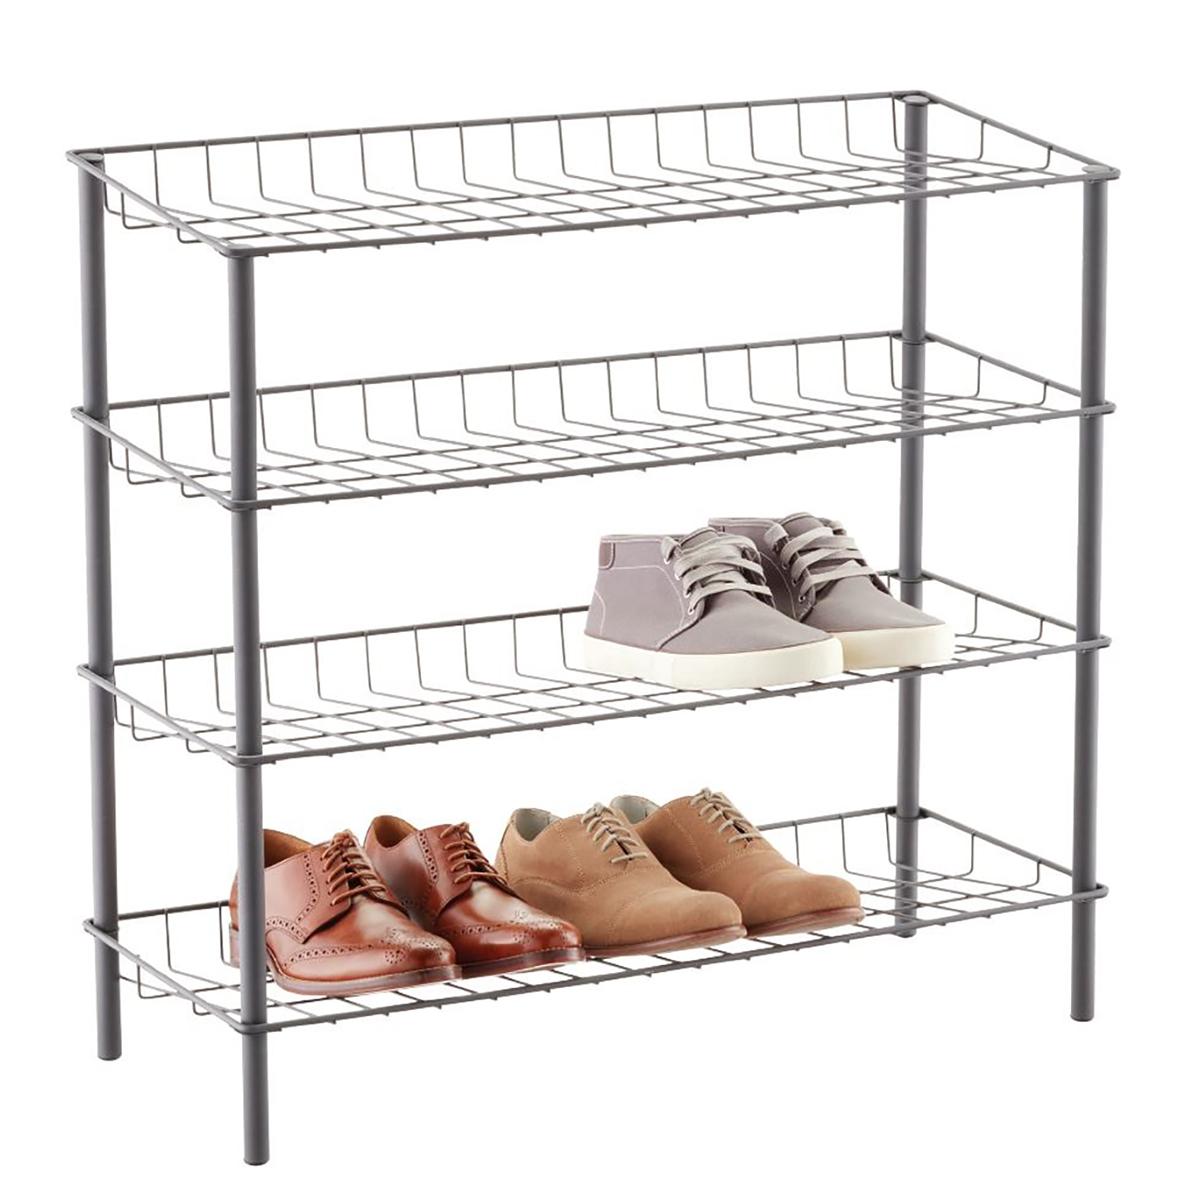 4 Tier Shoe Storage Shelf Rack Organizer Black Free Standing Holds 12 Pairs S247